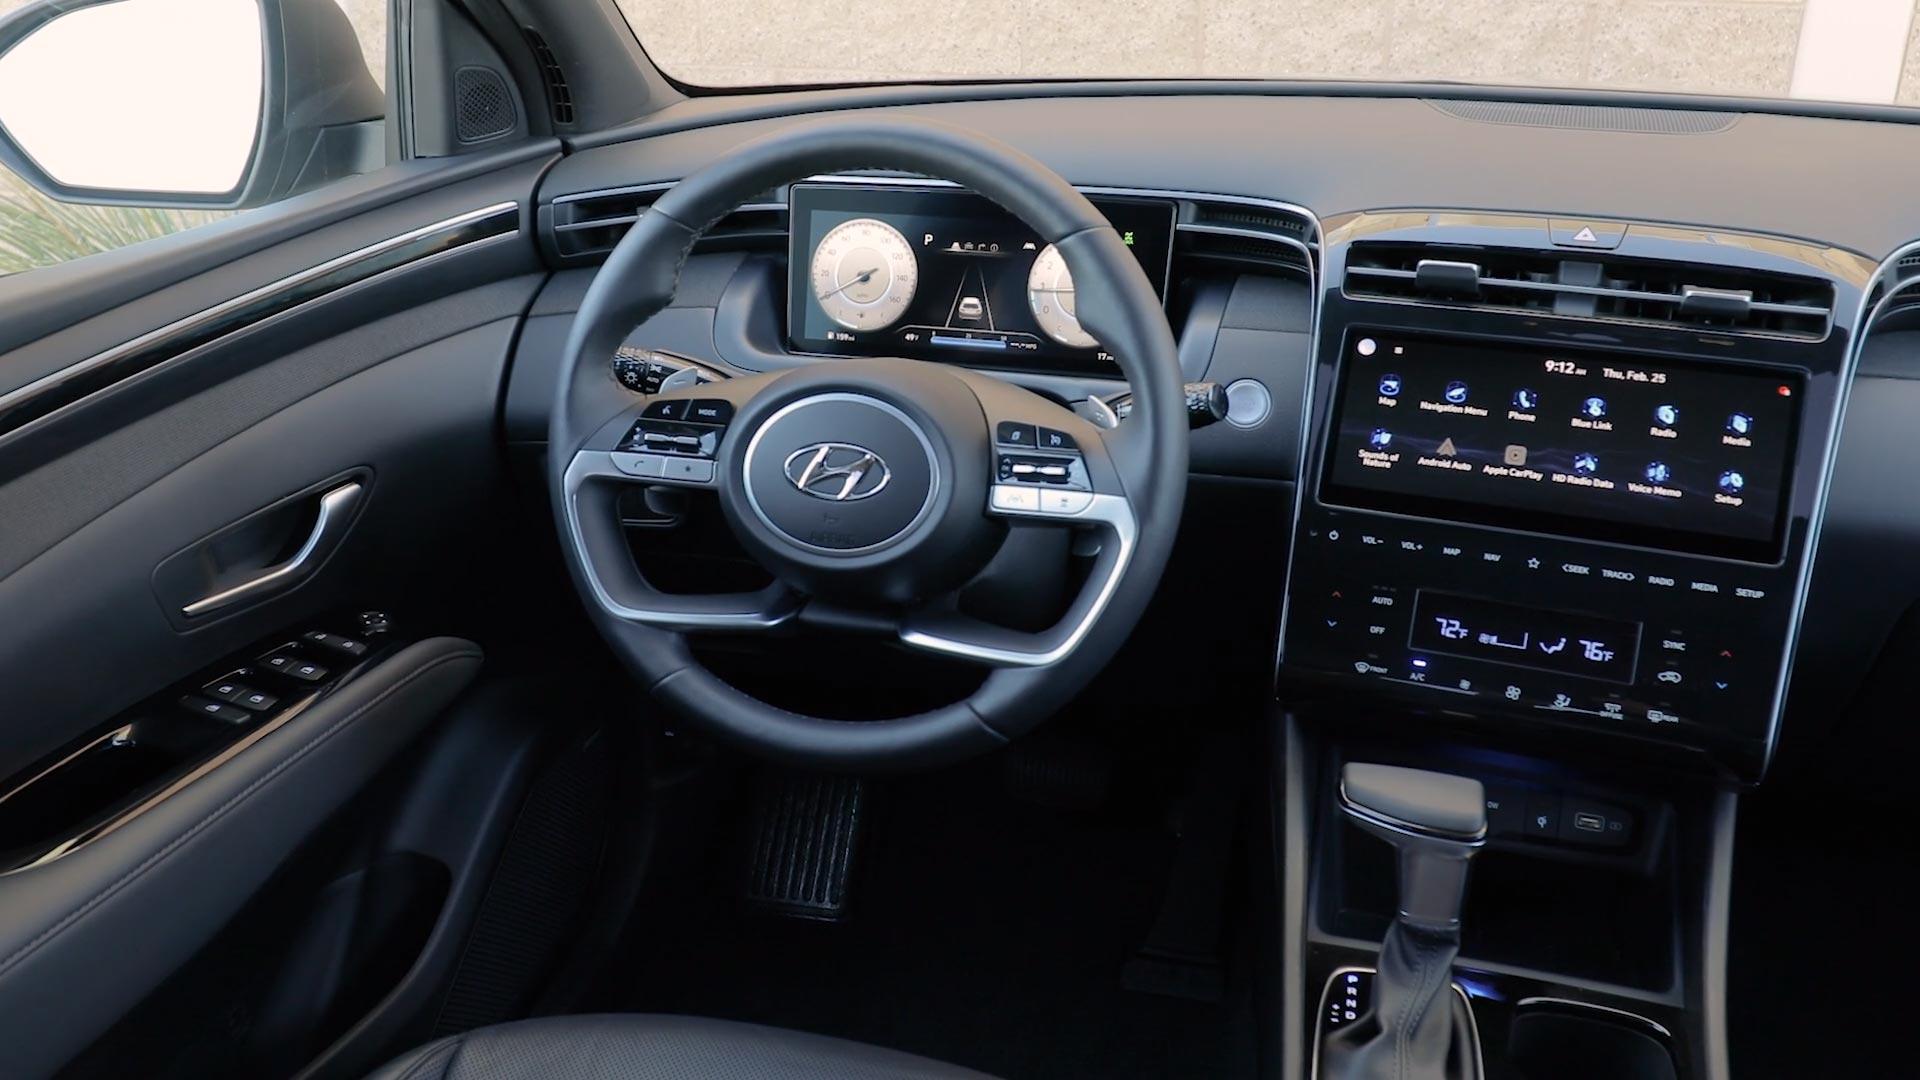 Hyundai Santa Cruz Steering Wheel and Center Console